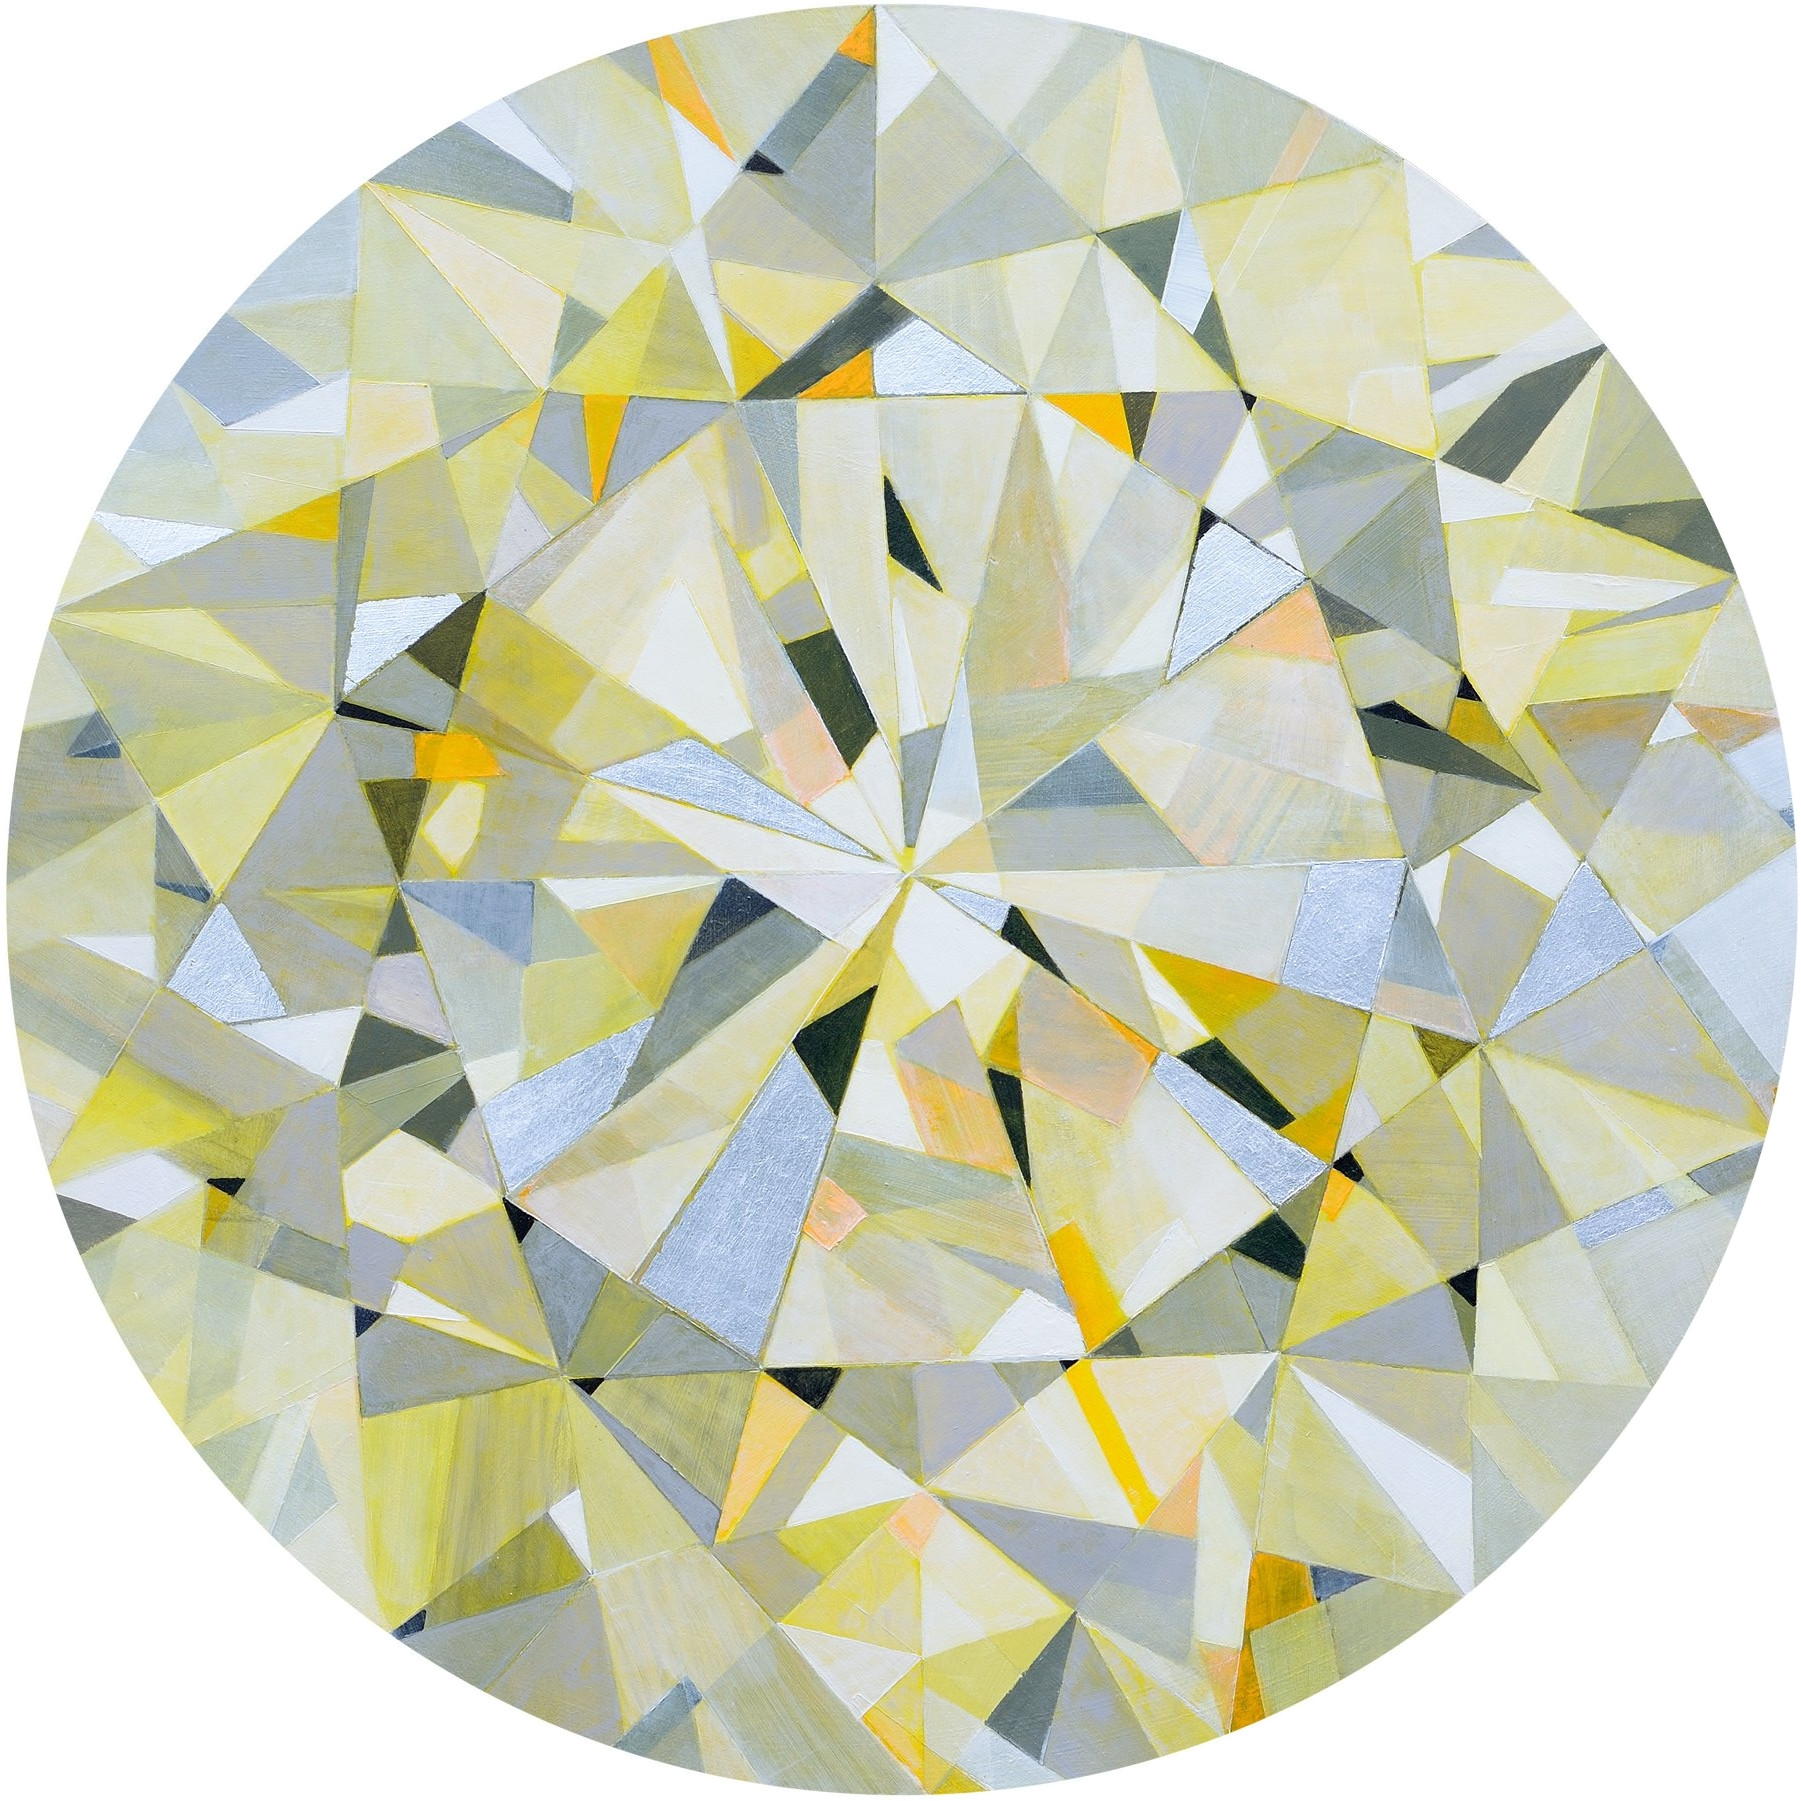 Seven Shades of Grey by Ilona B